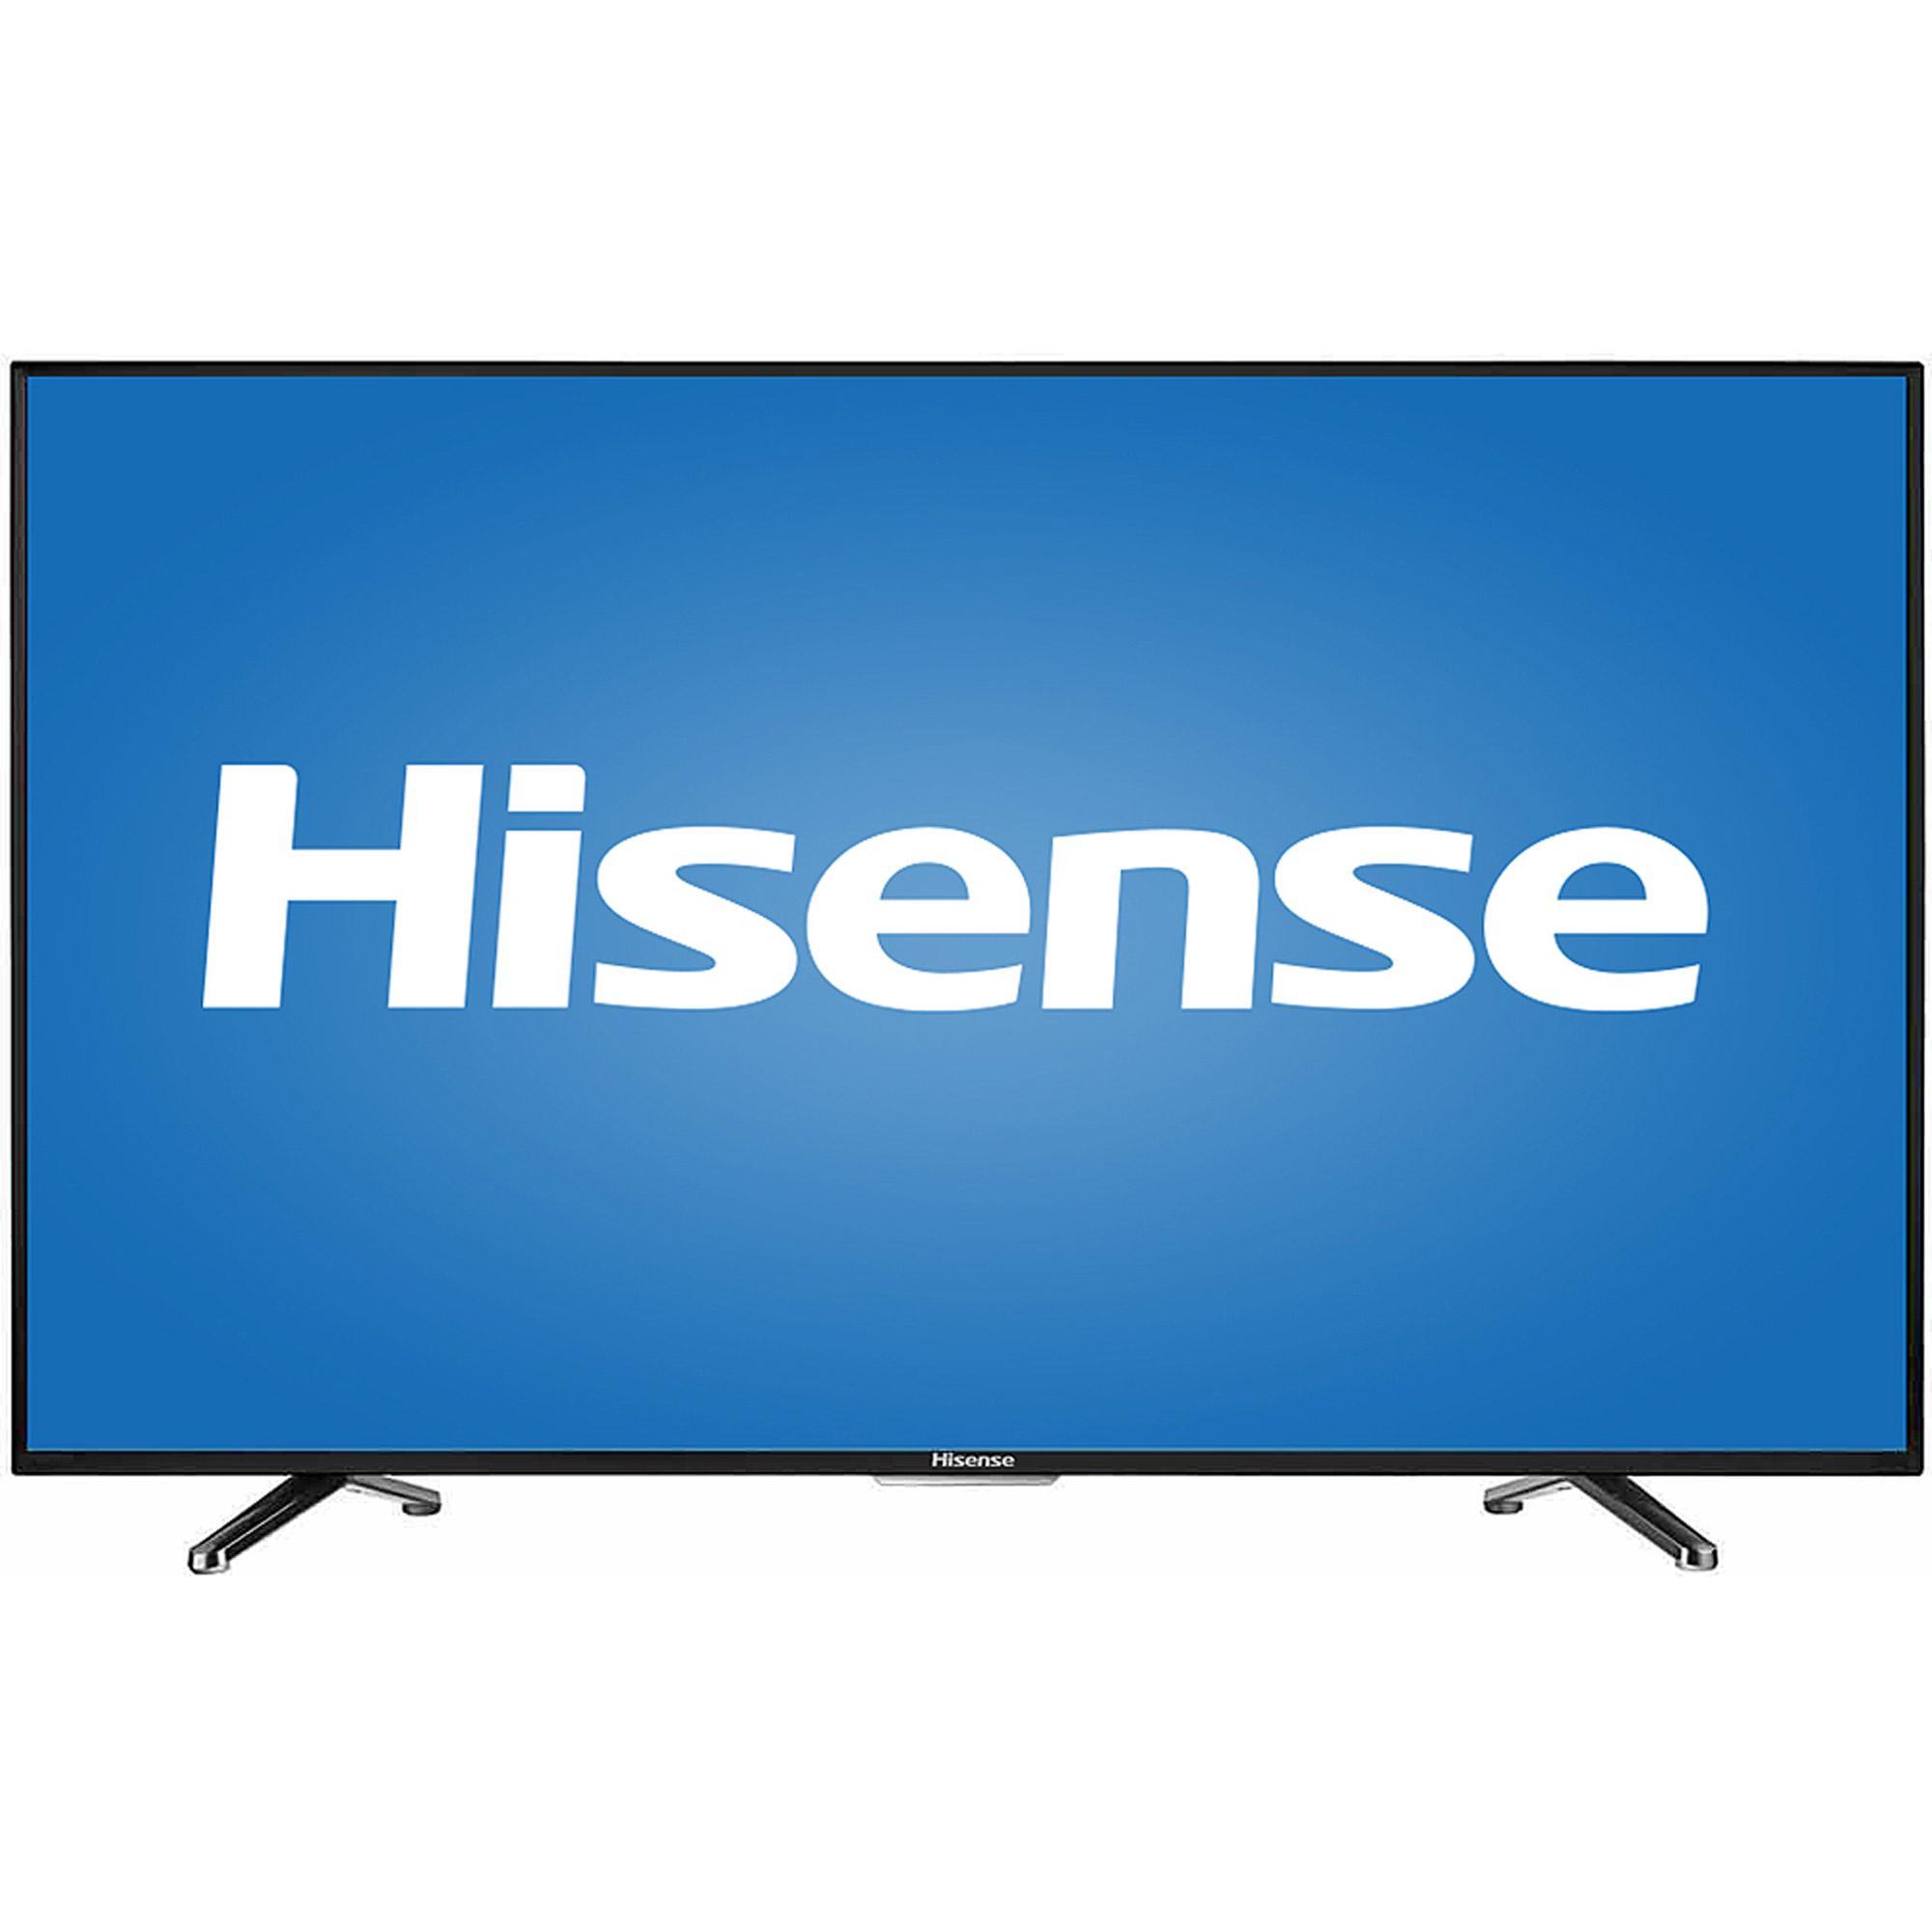 Walmart, $369.99, 55 inch Hisense 1080p Smart HDTV (55H6B)